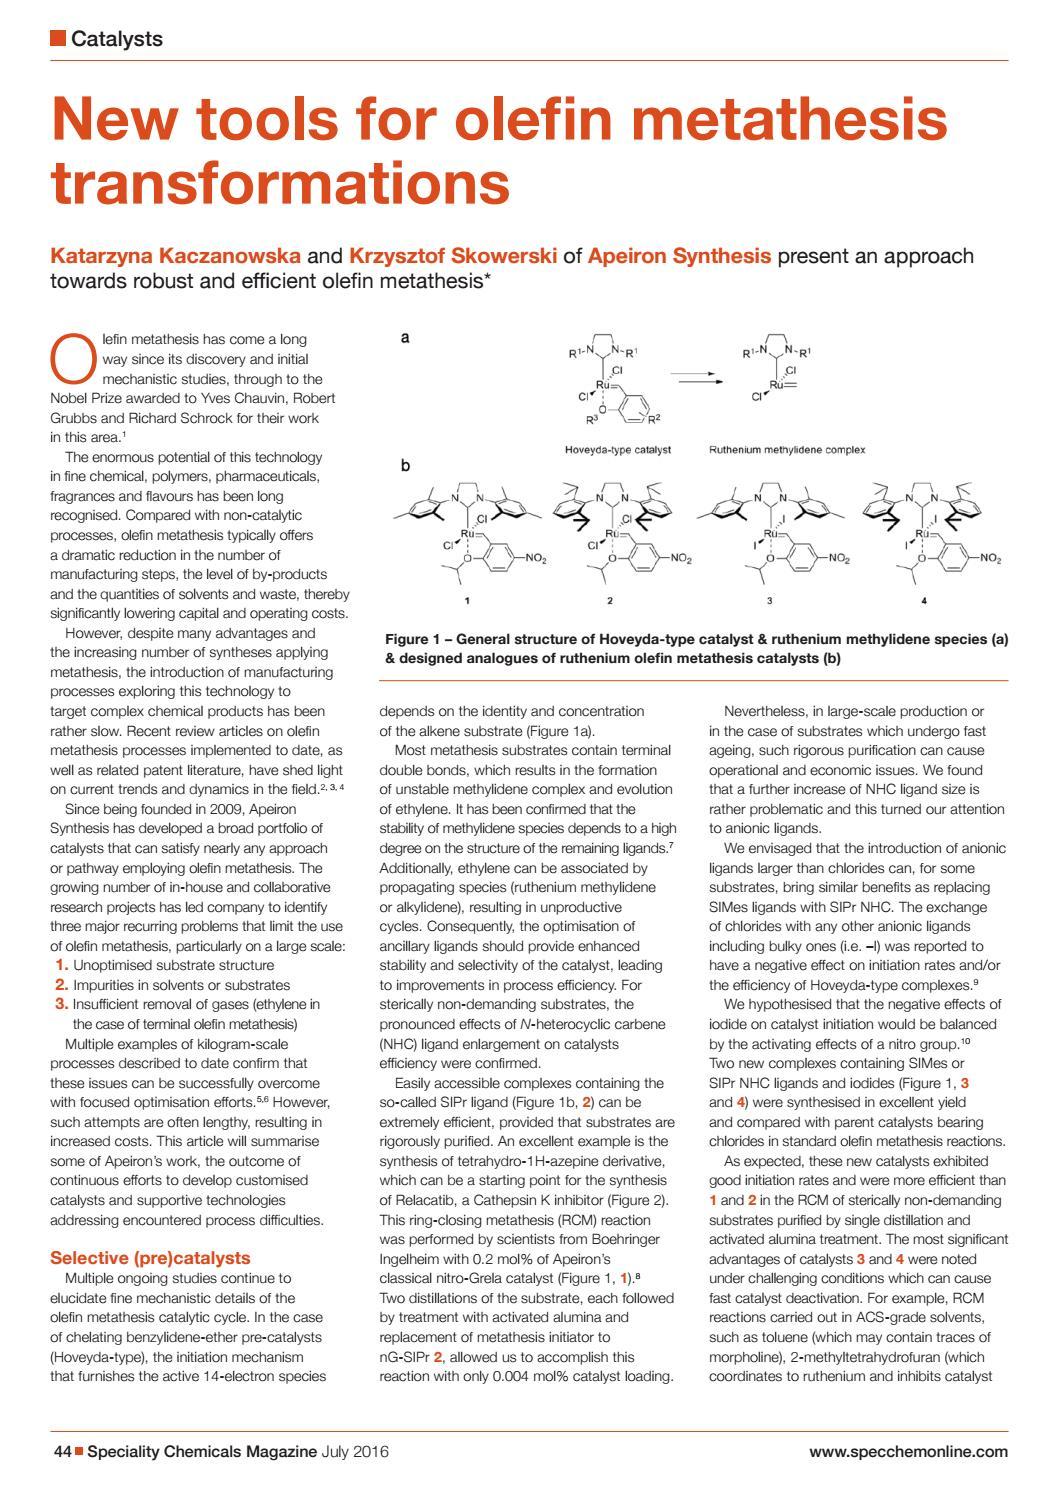 olefin metathesis industry